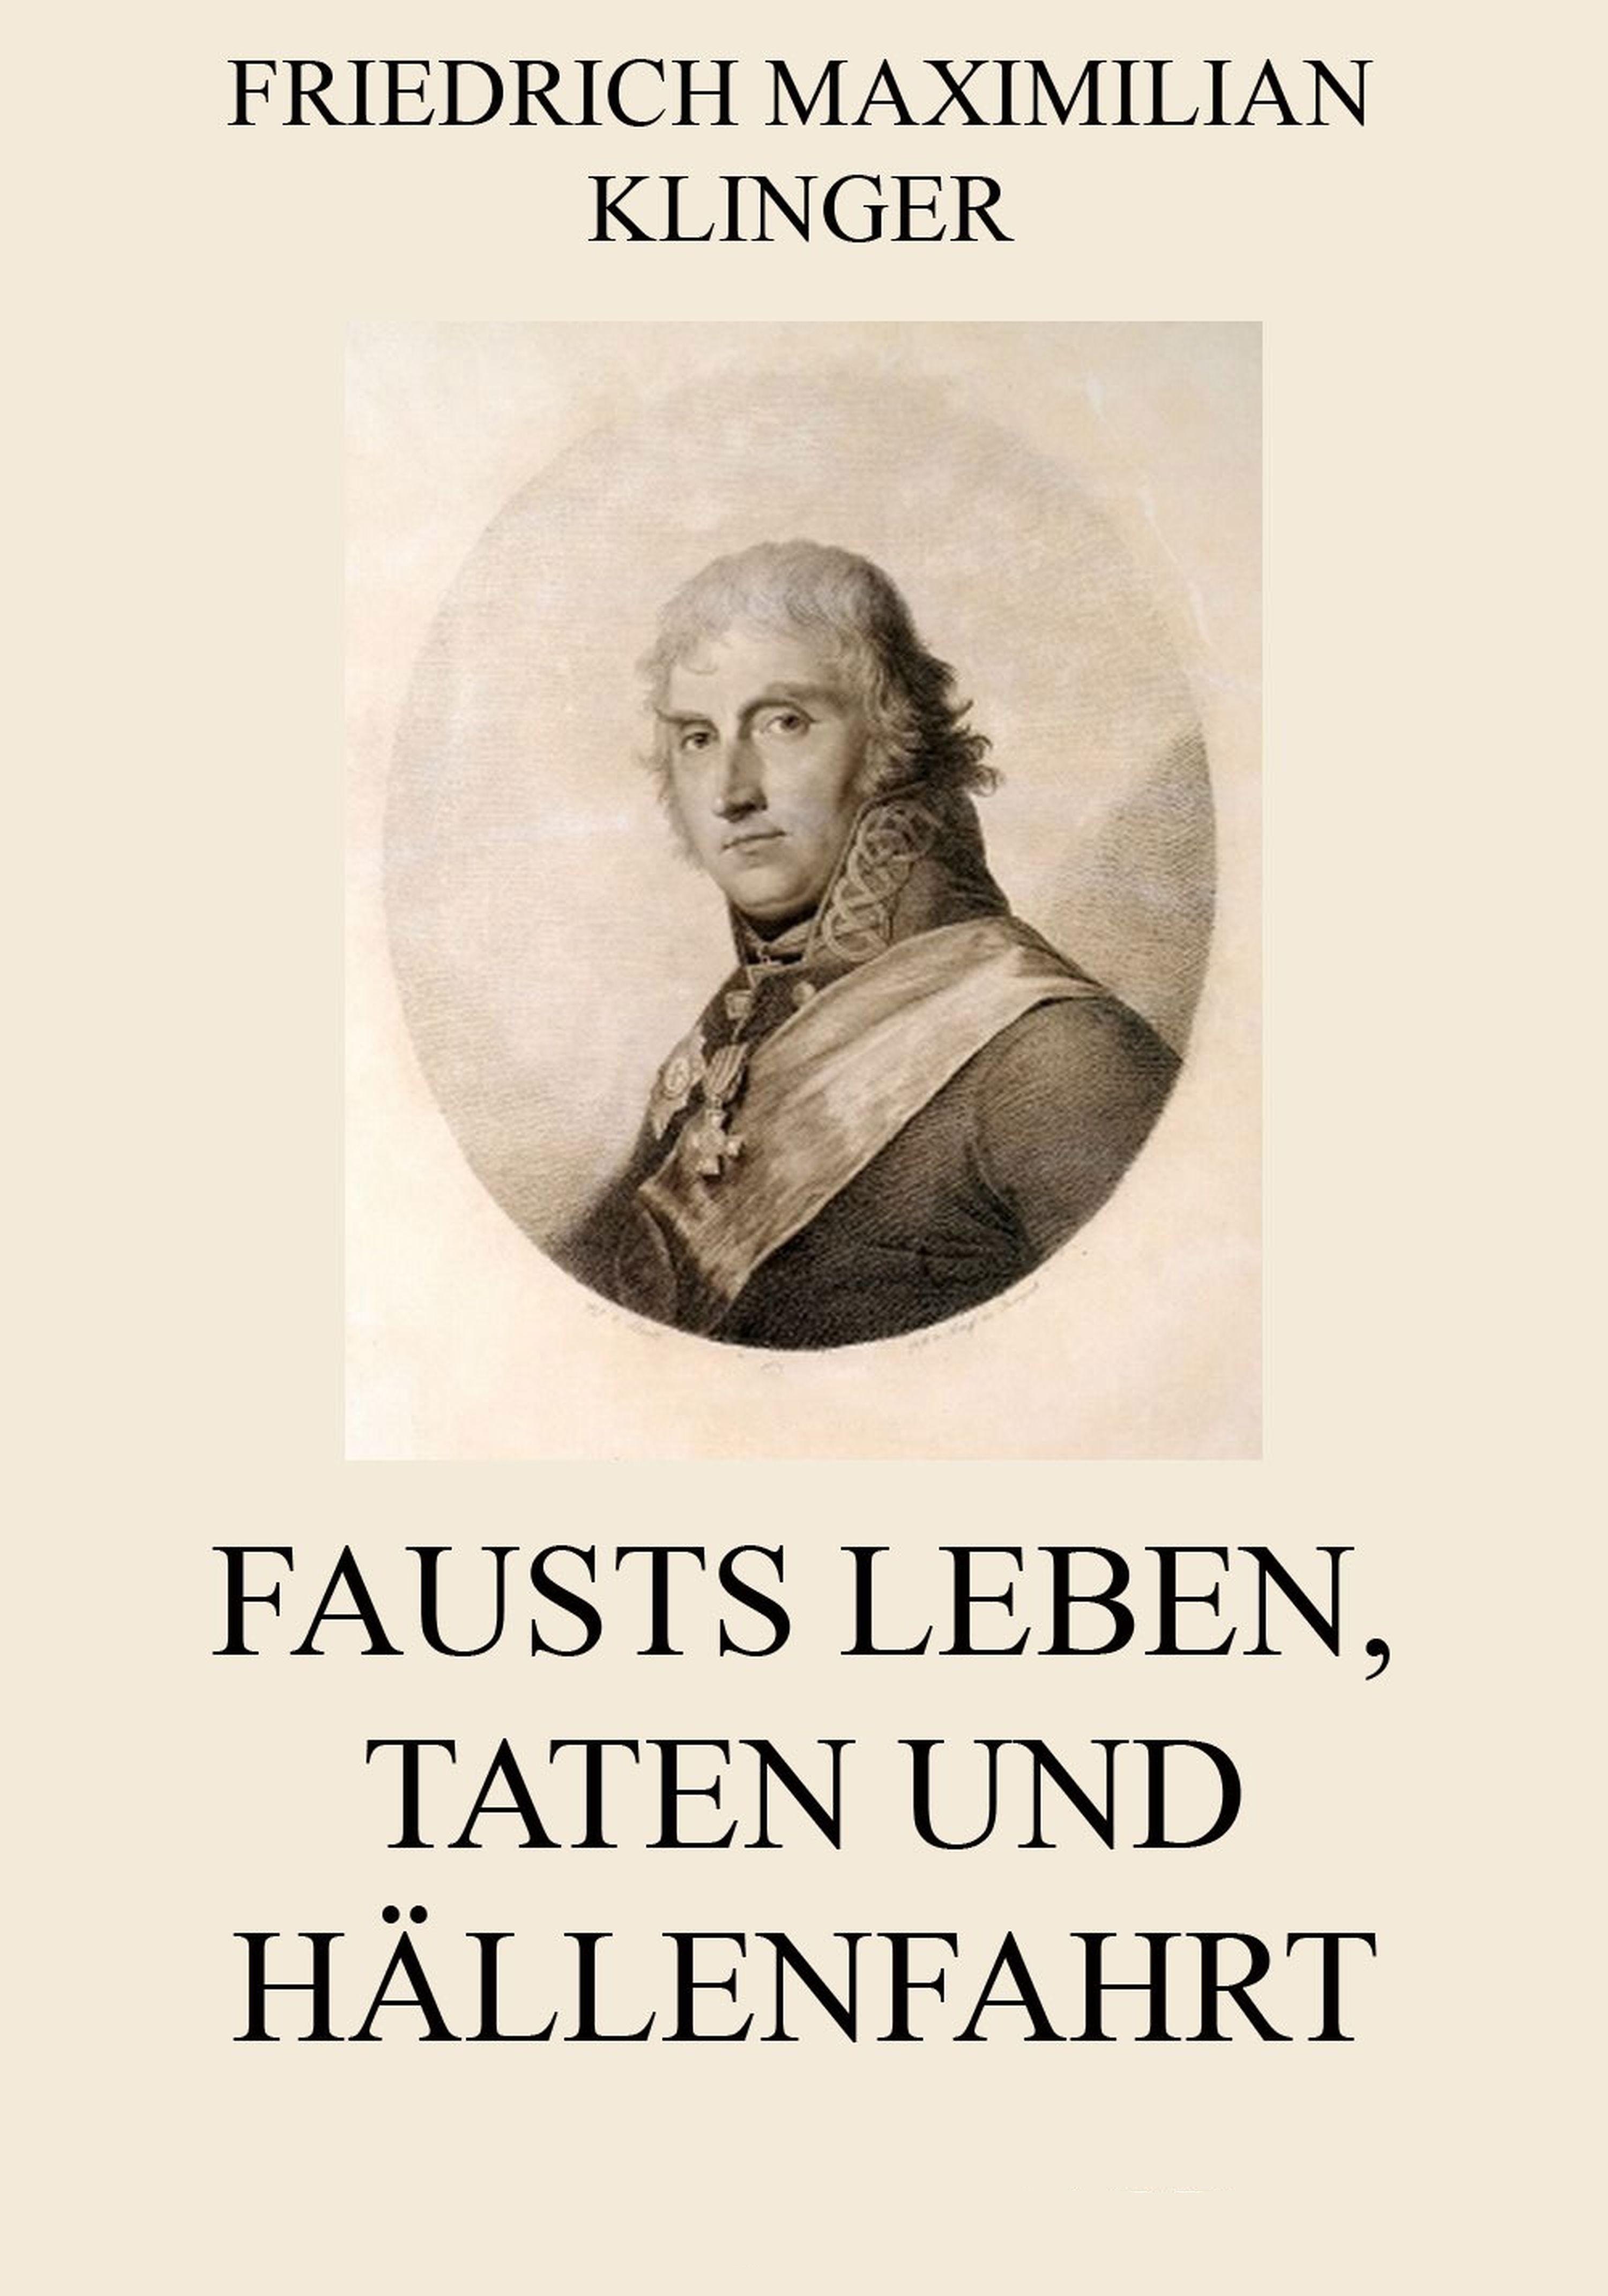 Friedrich Maximilian Klinger Fausts Leben, Taten und Höllenfahrt